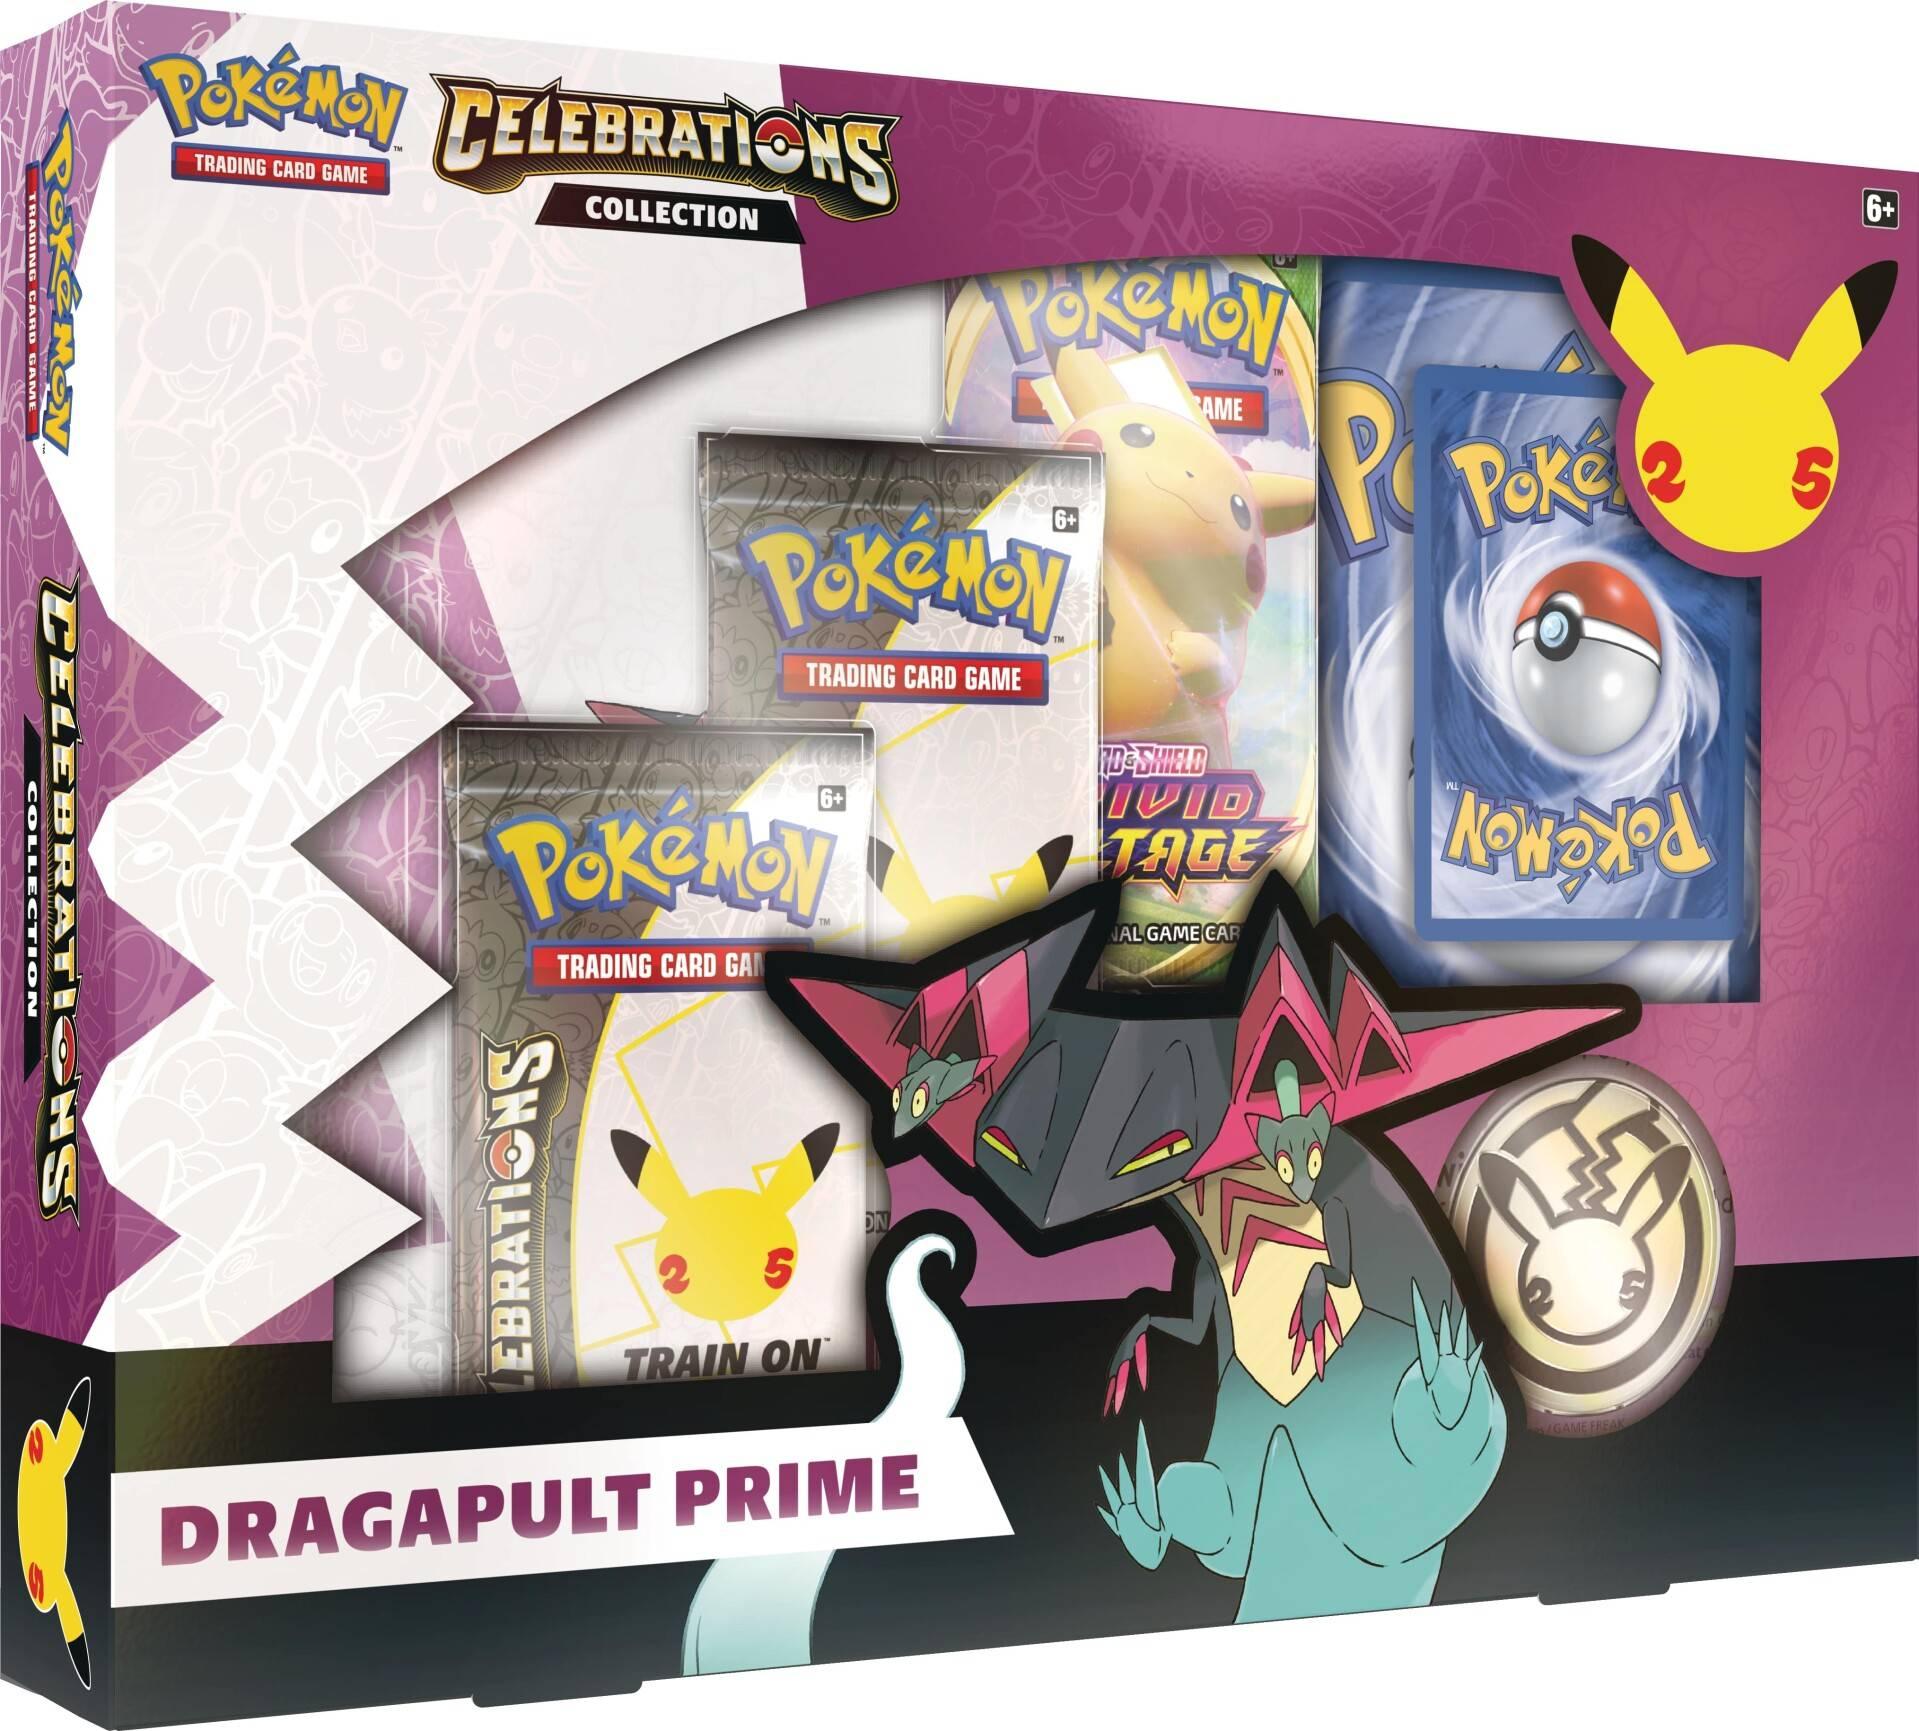 pokemon-tcg-celebration-dragapult-prime-collection